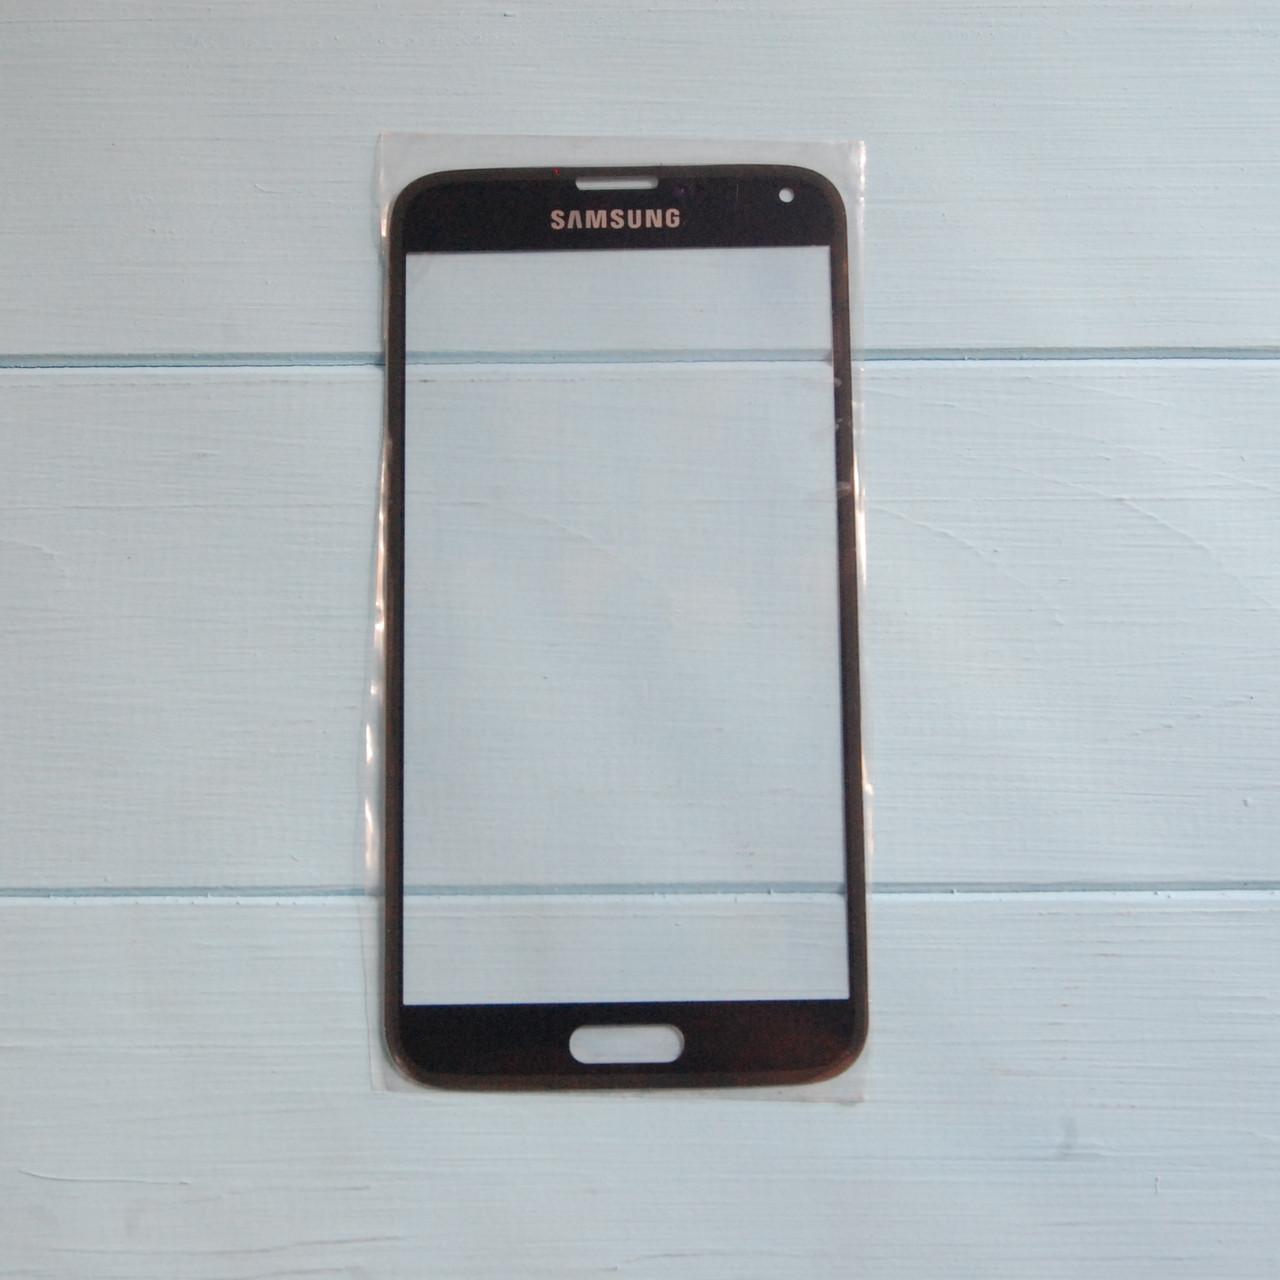 Стекло корпуса для Samsung G900F Galaxy S5, G900H Galaxy S5, G900T Galaxy S5, синее